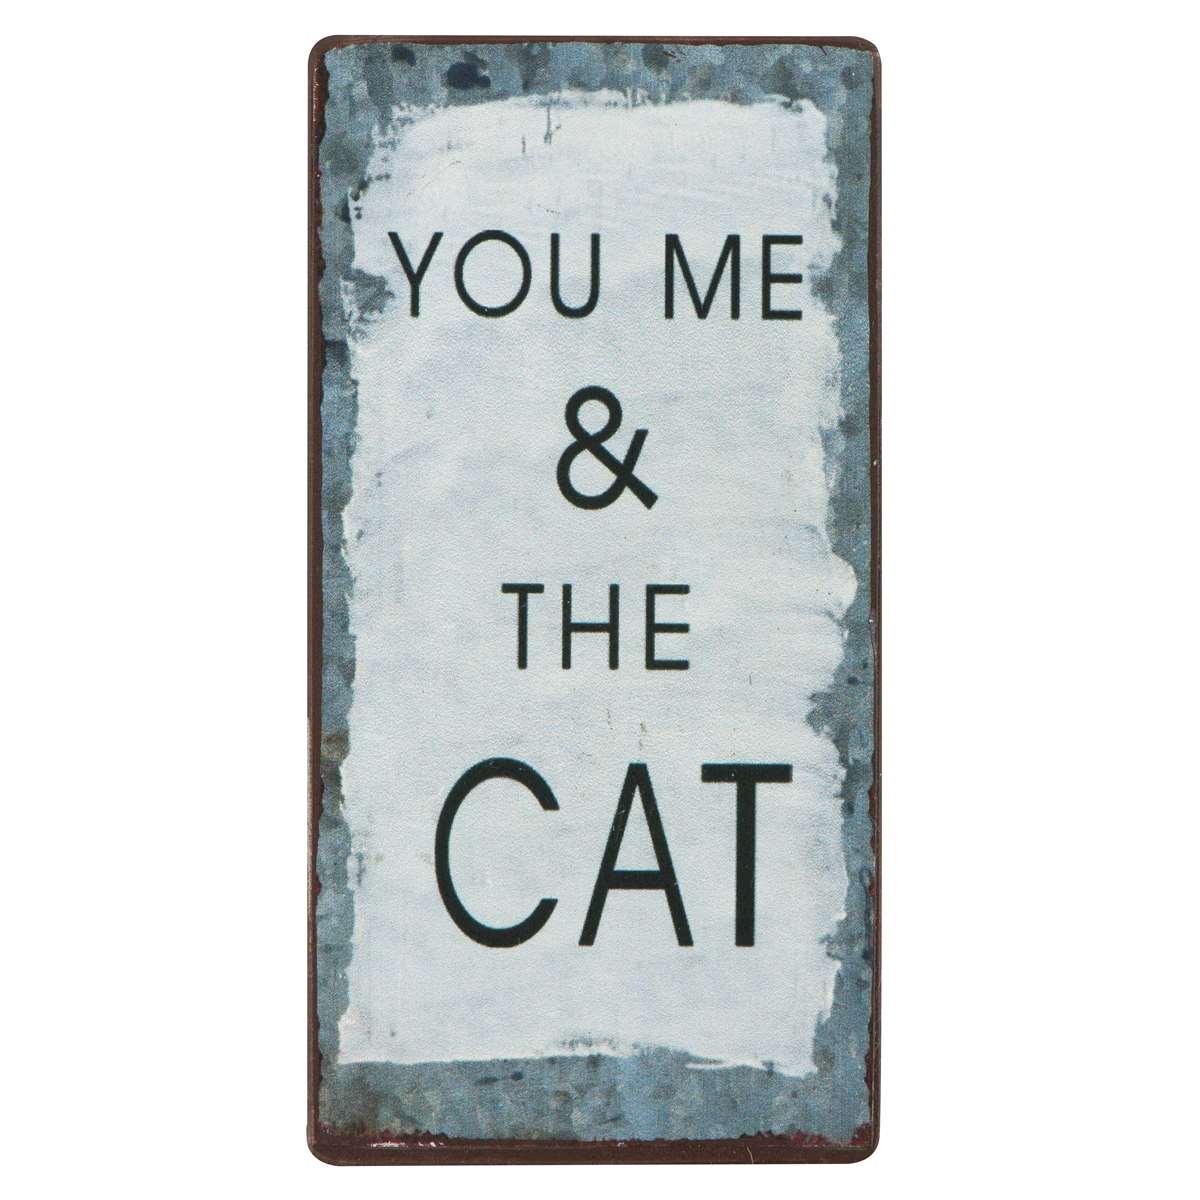 Witzigschilder - Magnet You me the cat - Onlineshop Tante Emmer